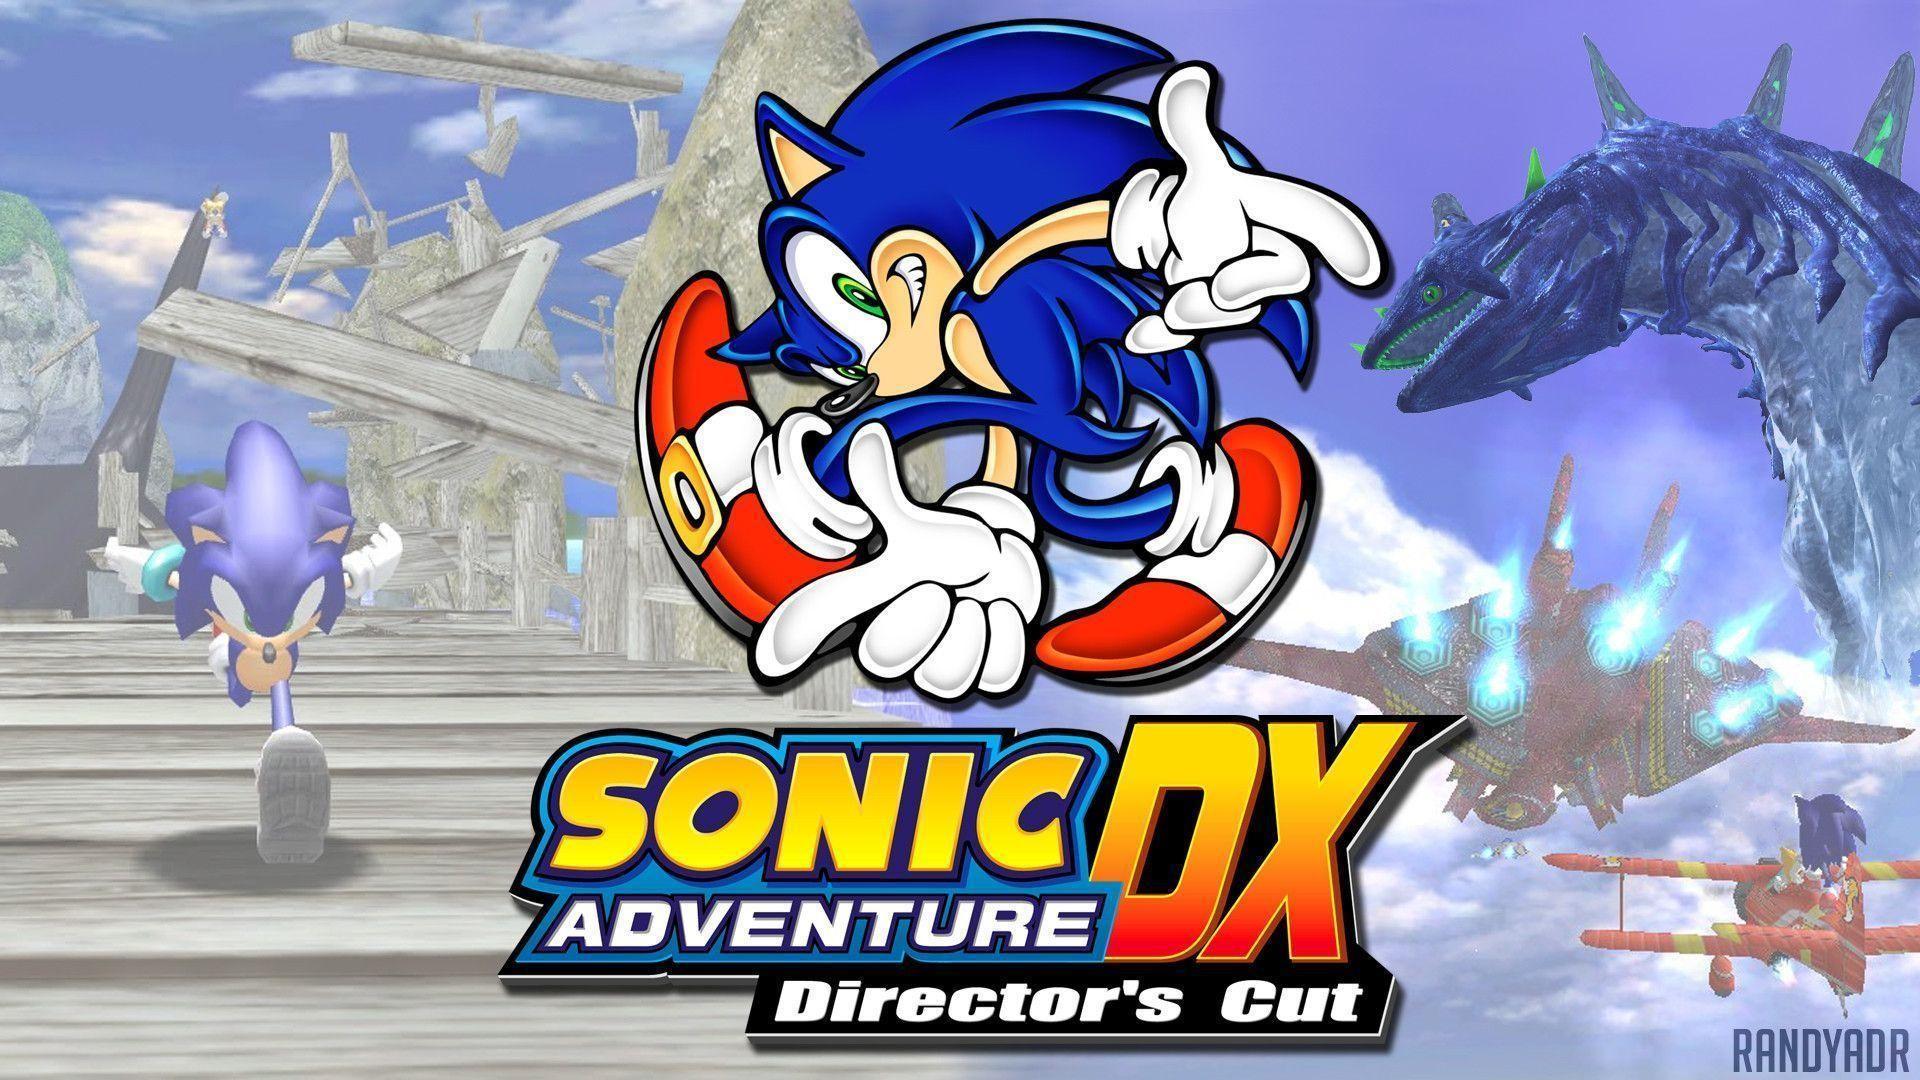 Sonic Adventure Wallpaper 67 images 1920x1080